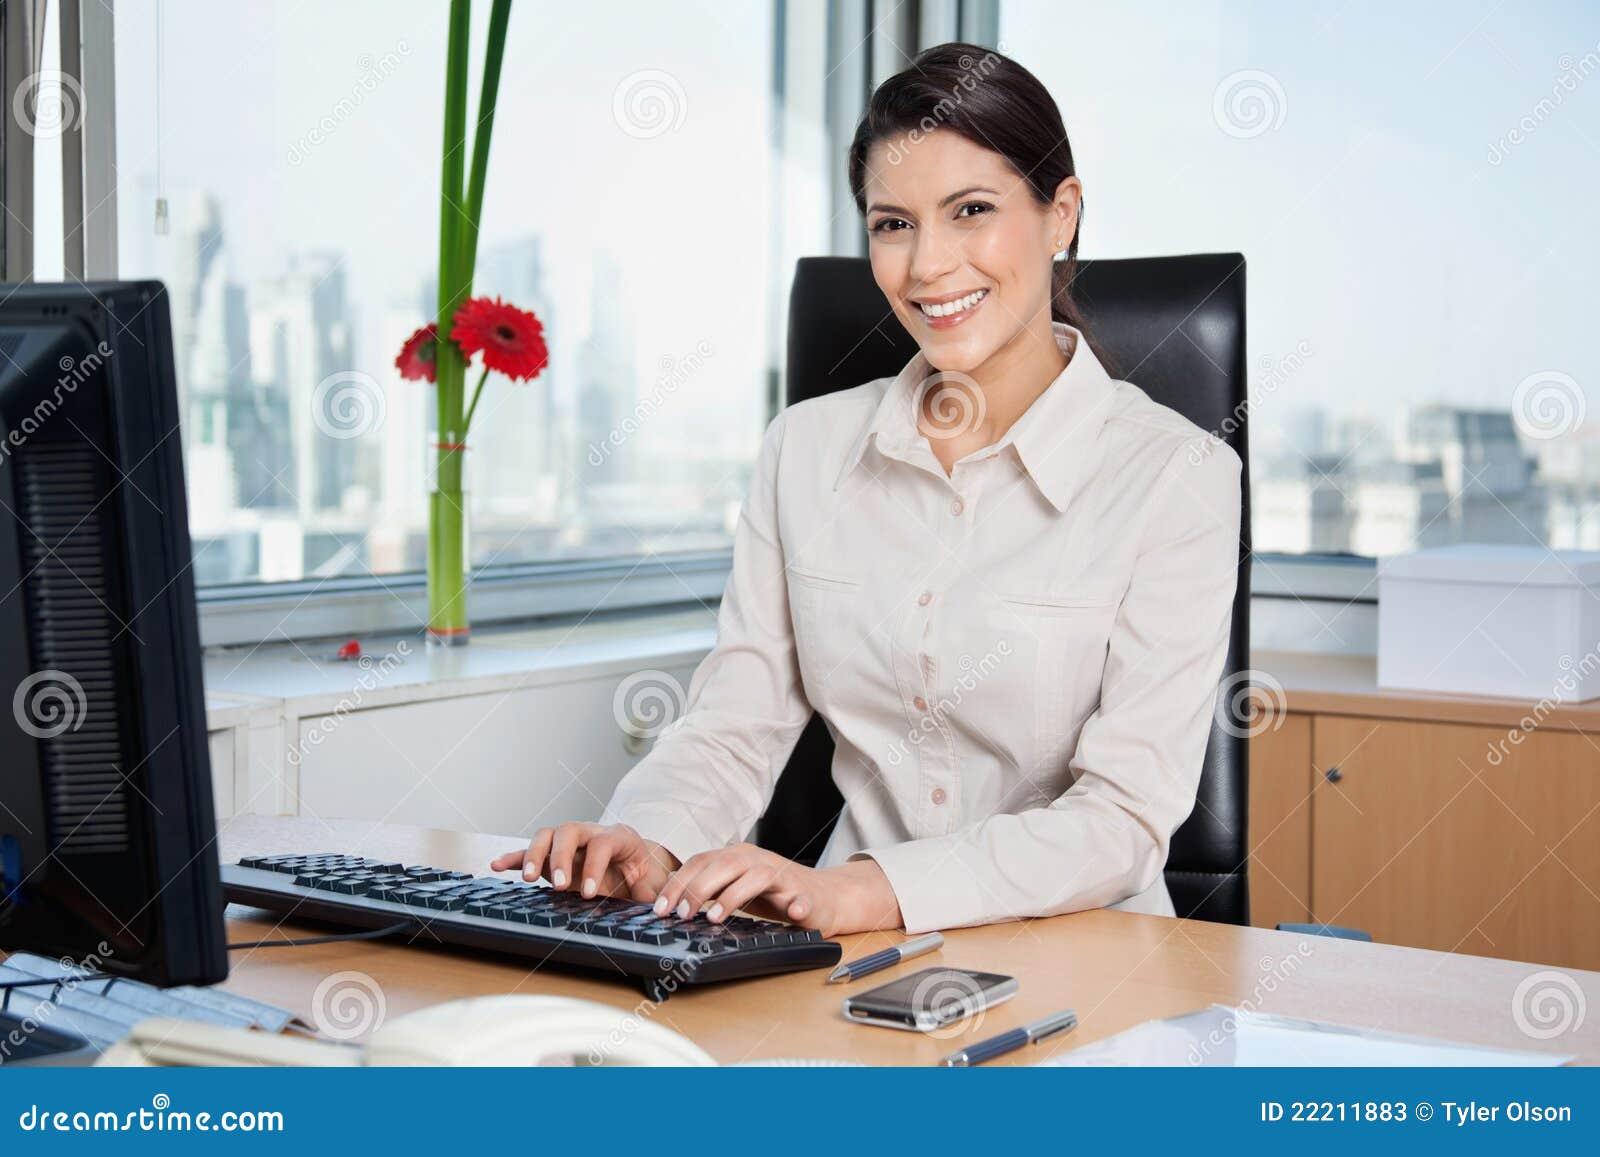 Female Entrepreneur Working On Computer Stock Photos - Image: 22211883